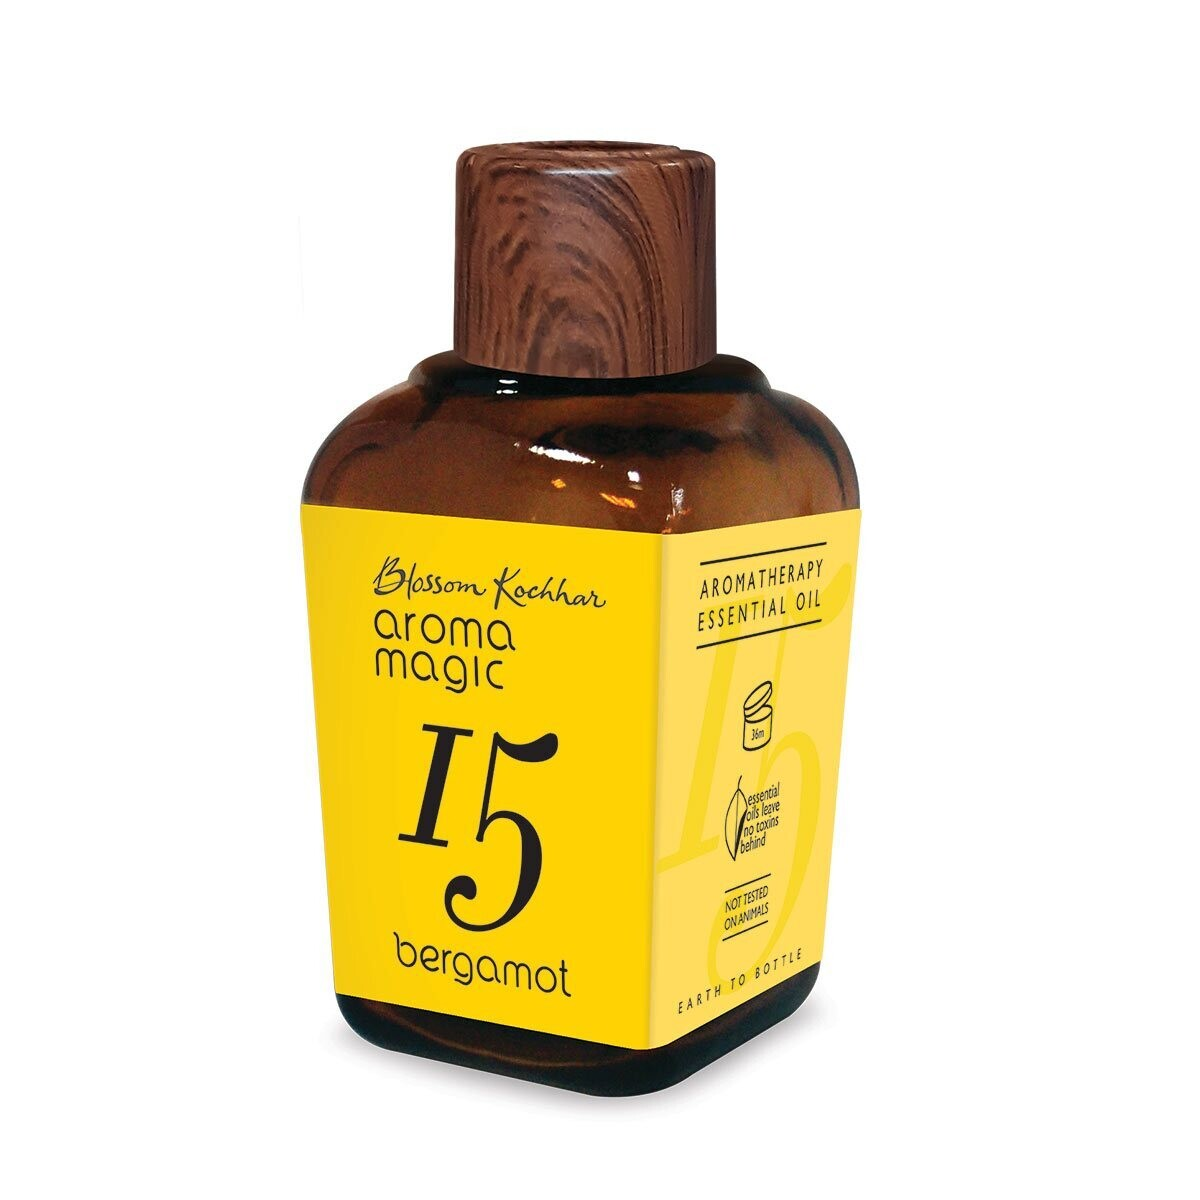 Aroma Magic 15 Bergamot Oil 20 Ml